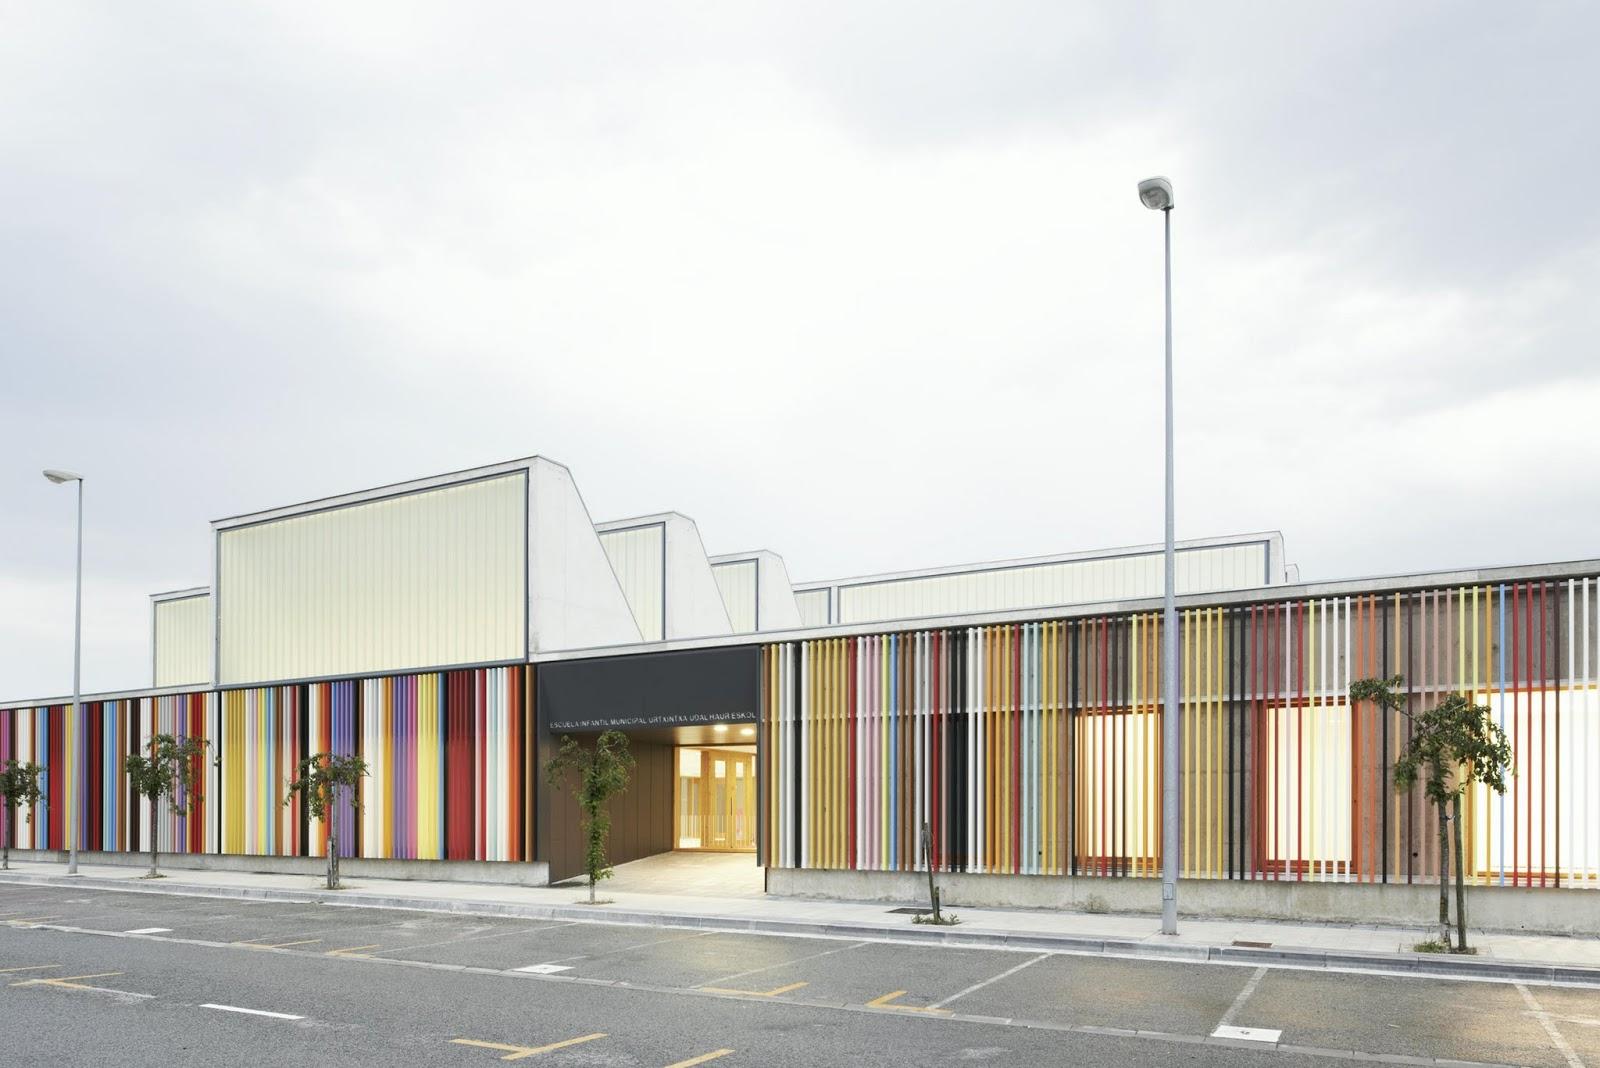 Arquitectura zona cero h gase la luz escuela infantil for Universidades para arquitectura